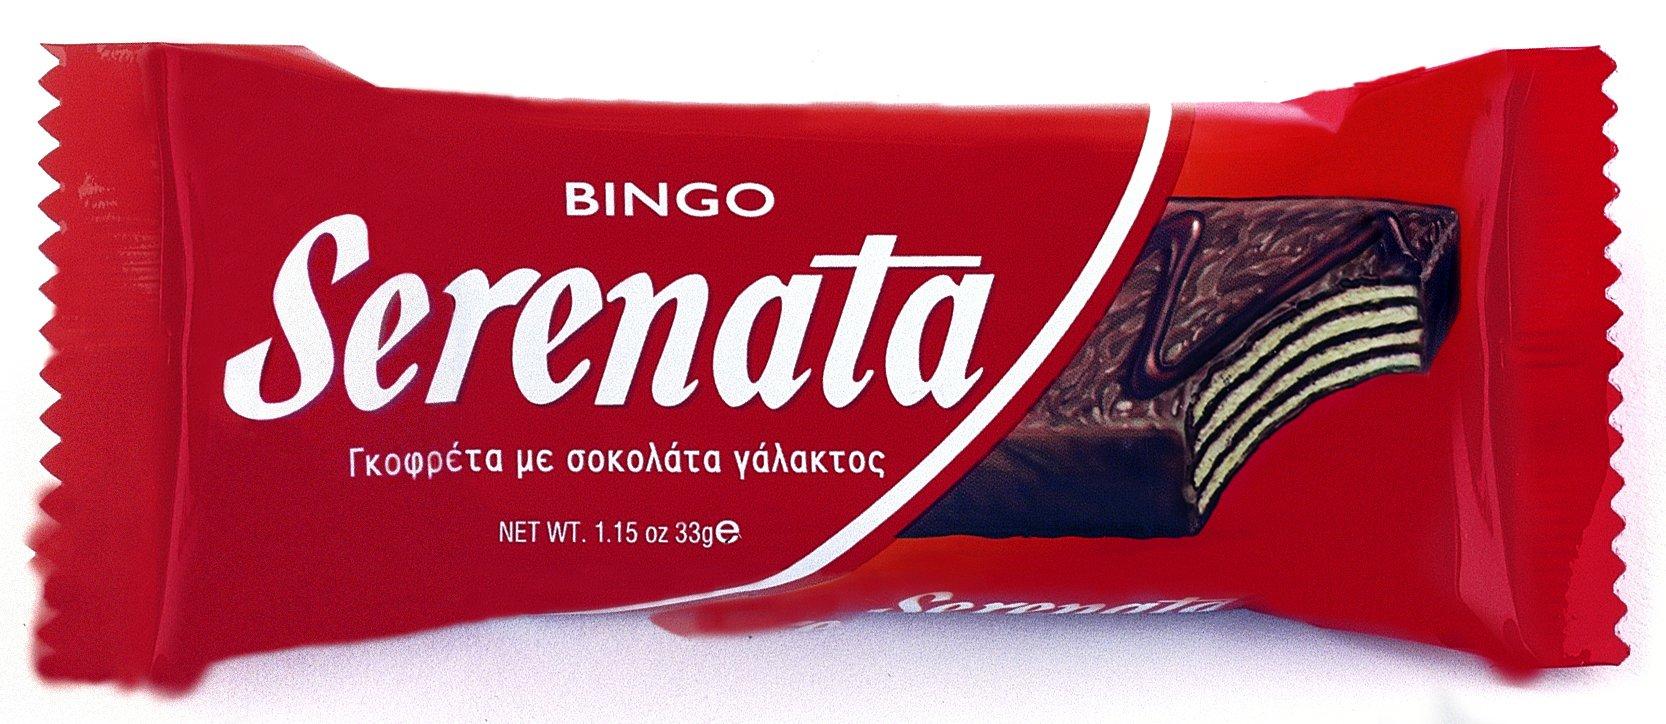 Image result for σερενατα κοκκινη